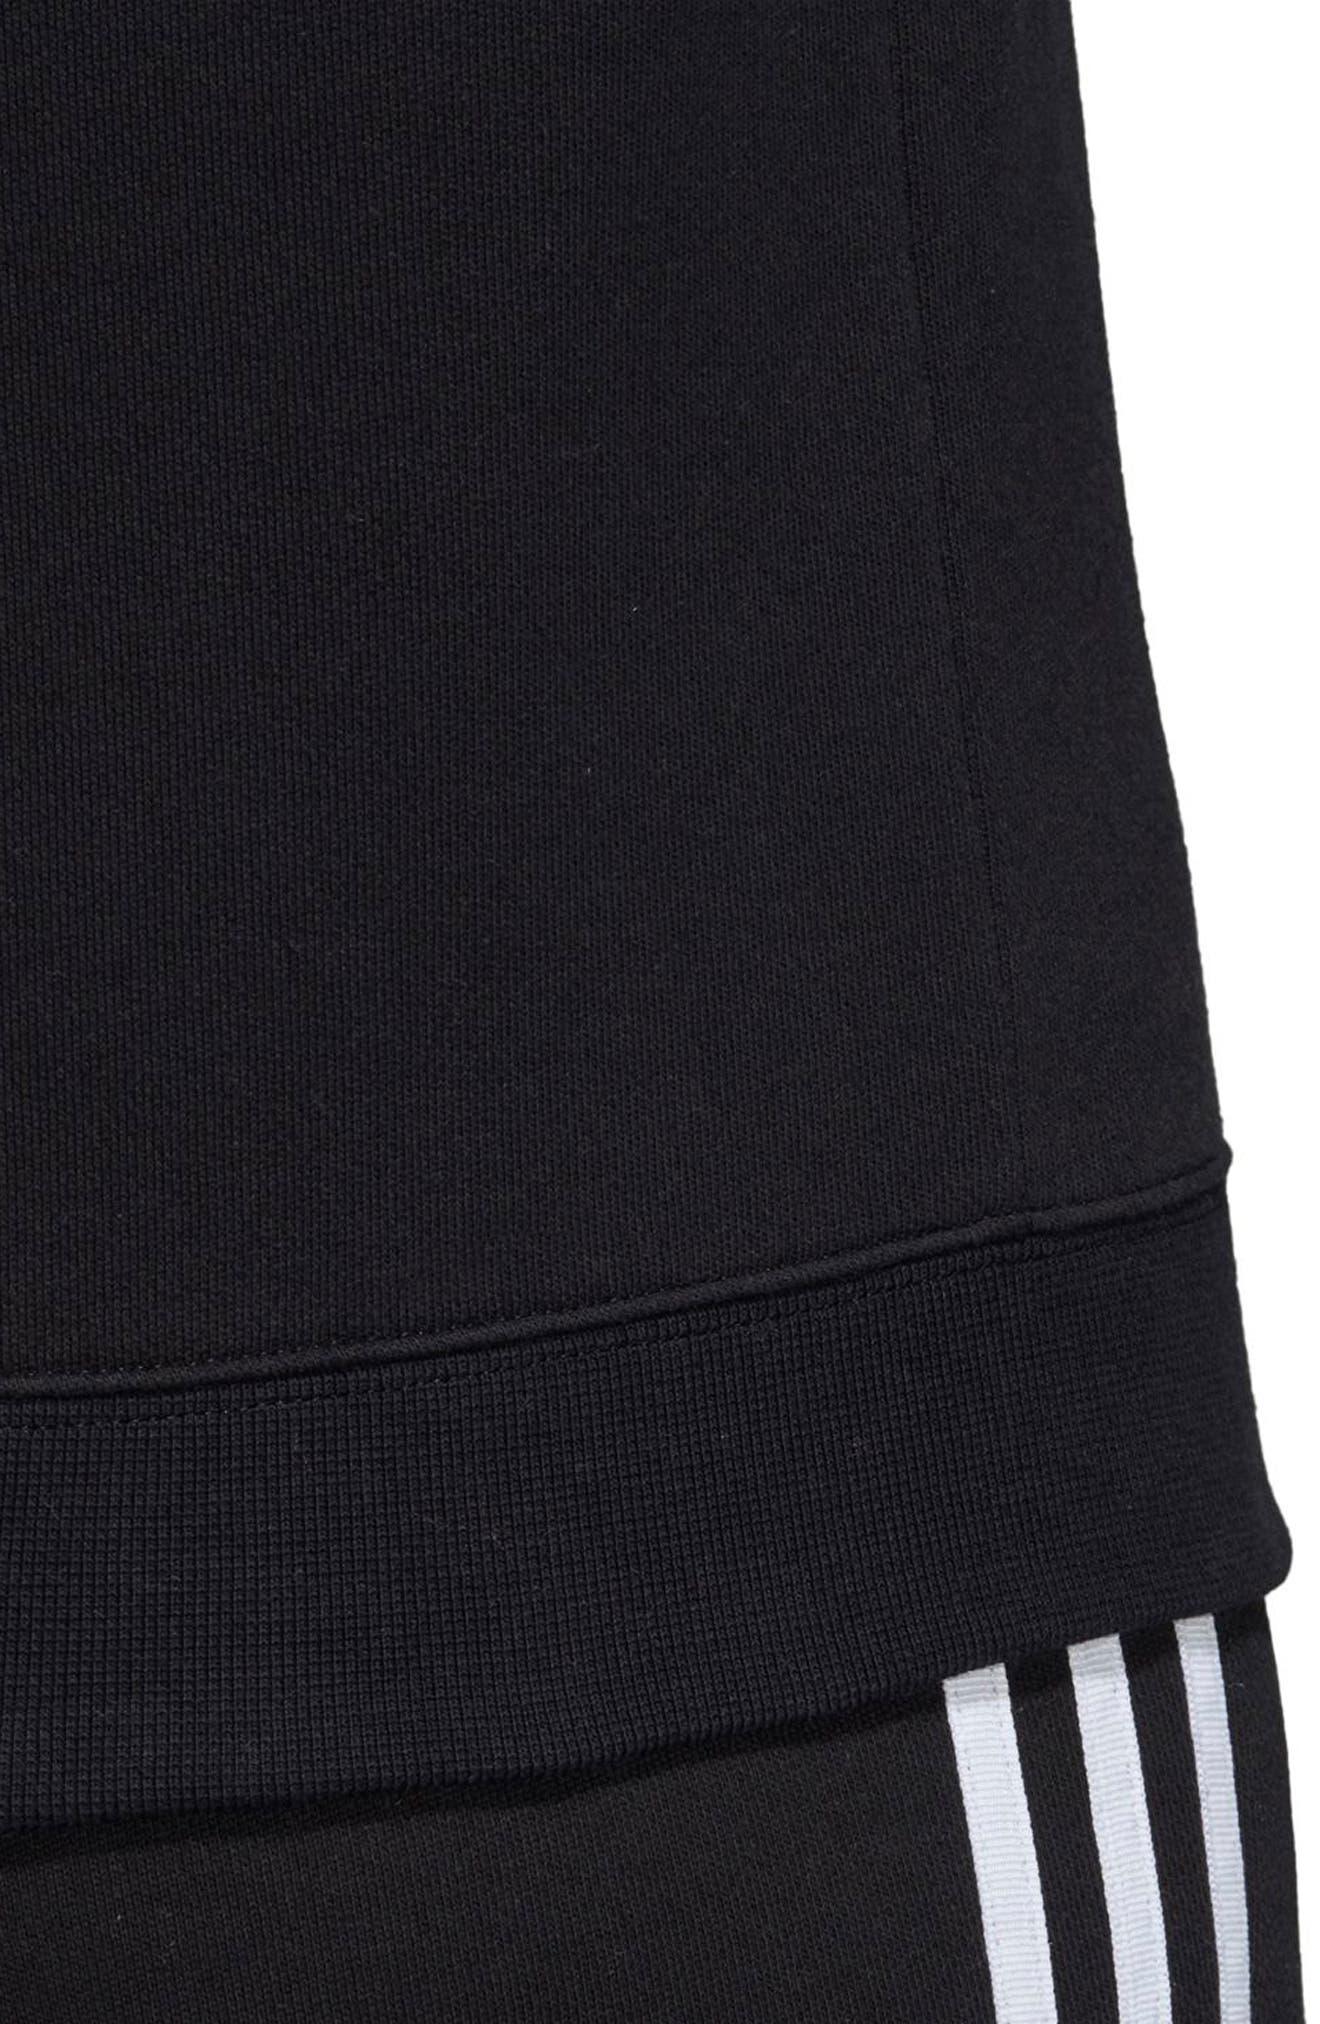 TRF Sweatshirt,                             Alternate thumbnail 5, color,                             BLACK